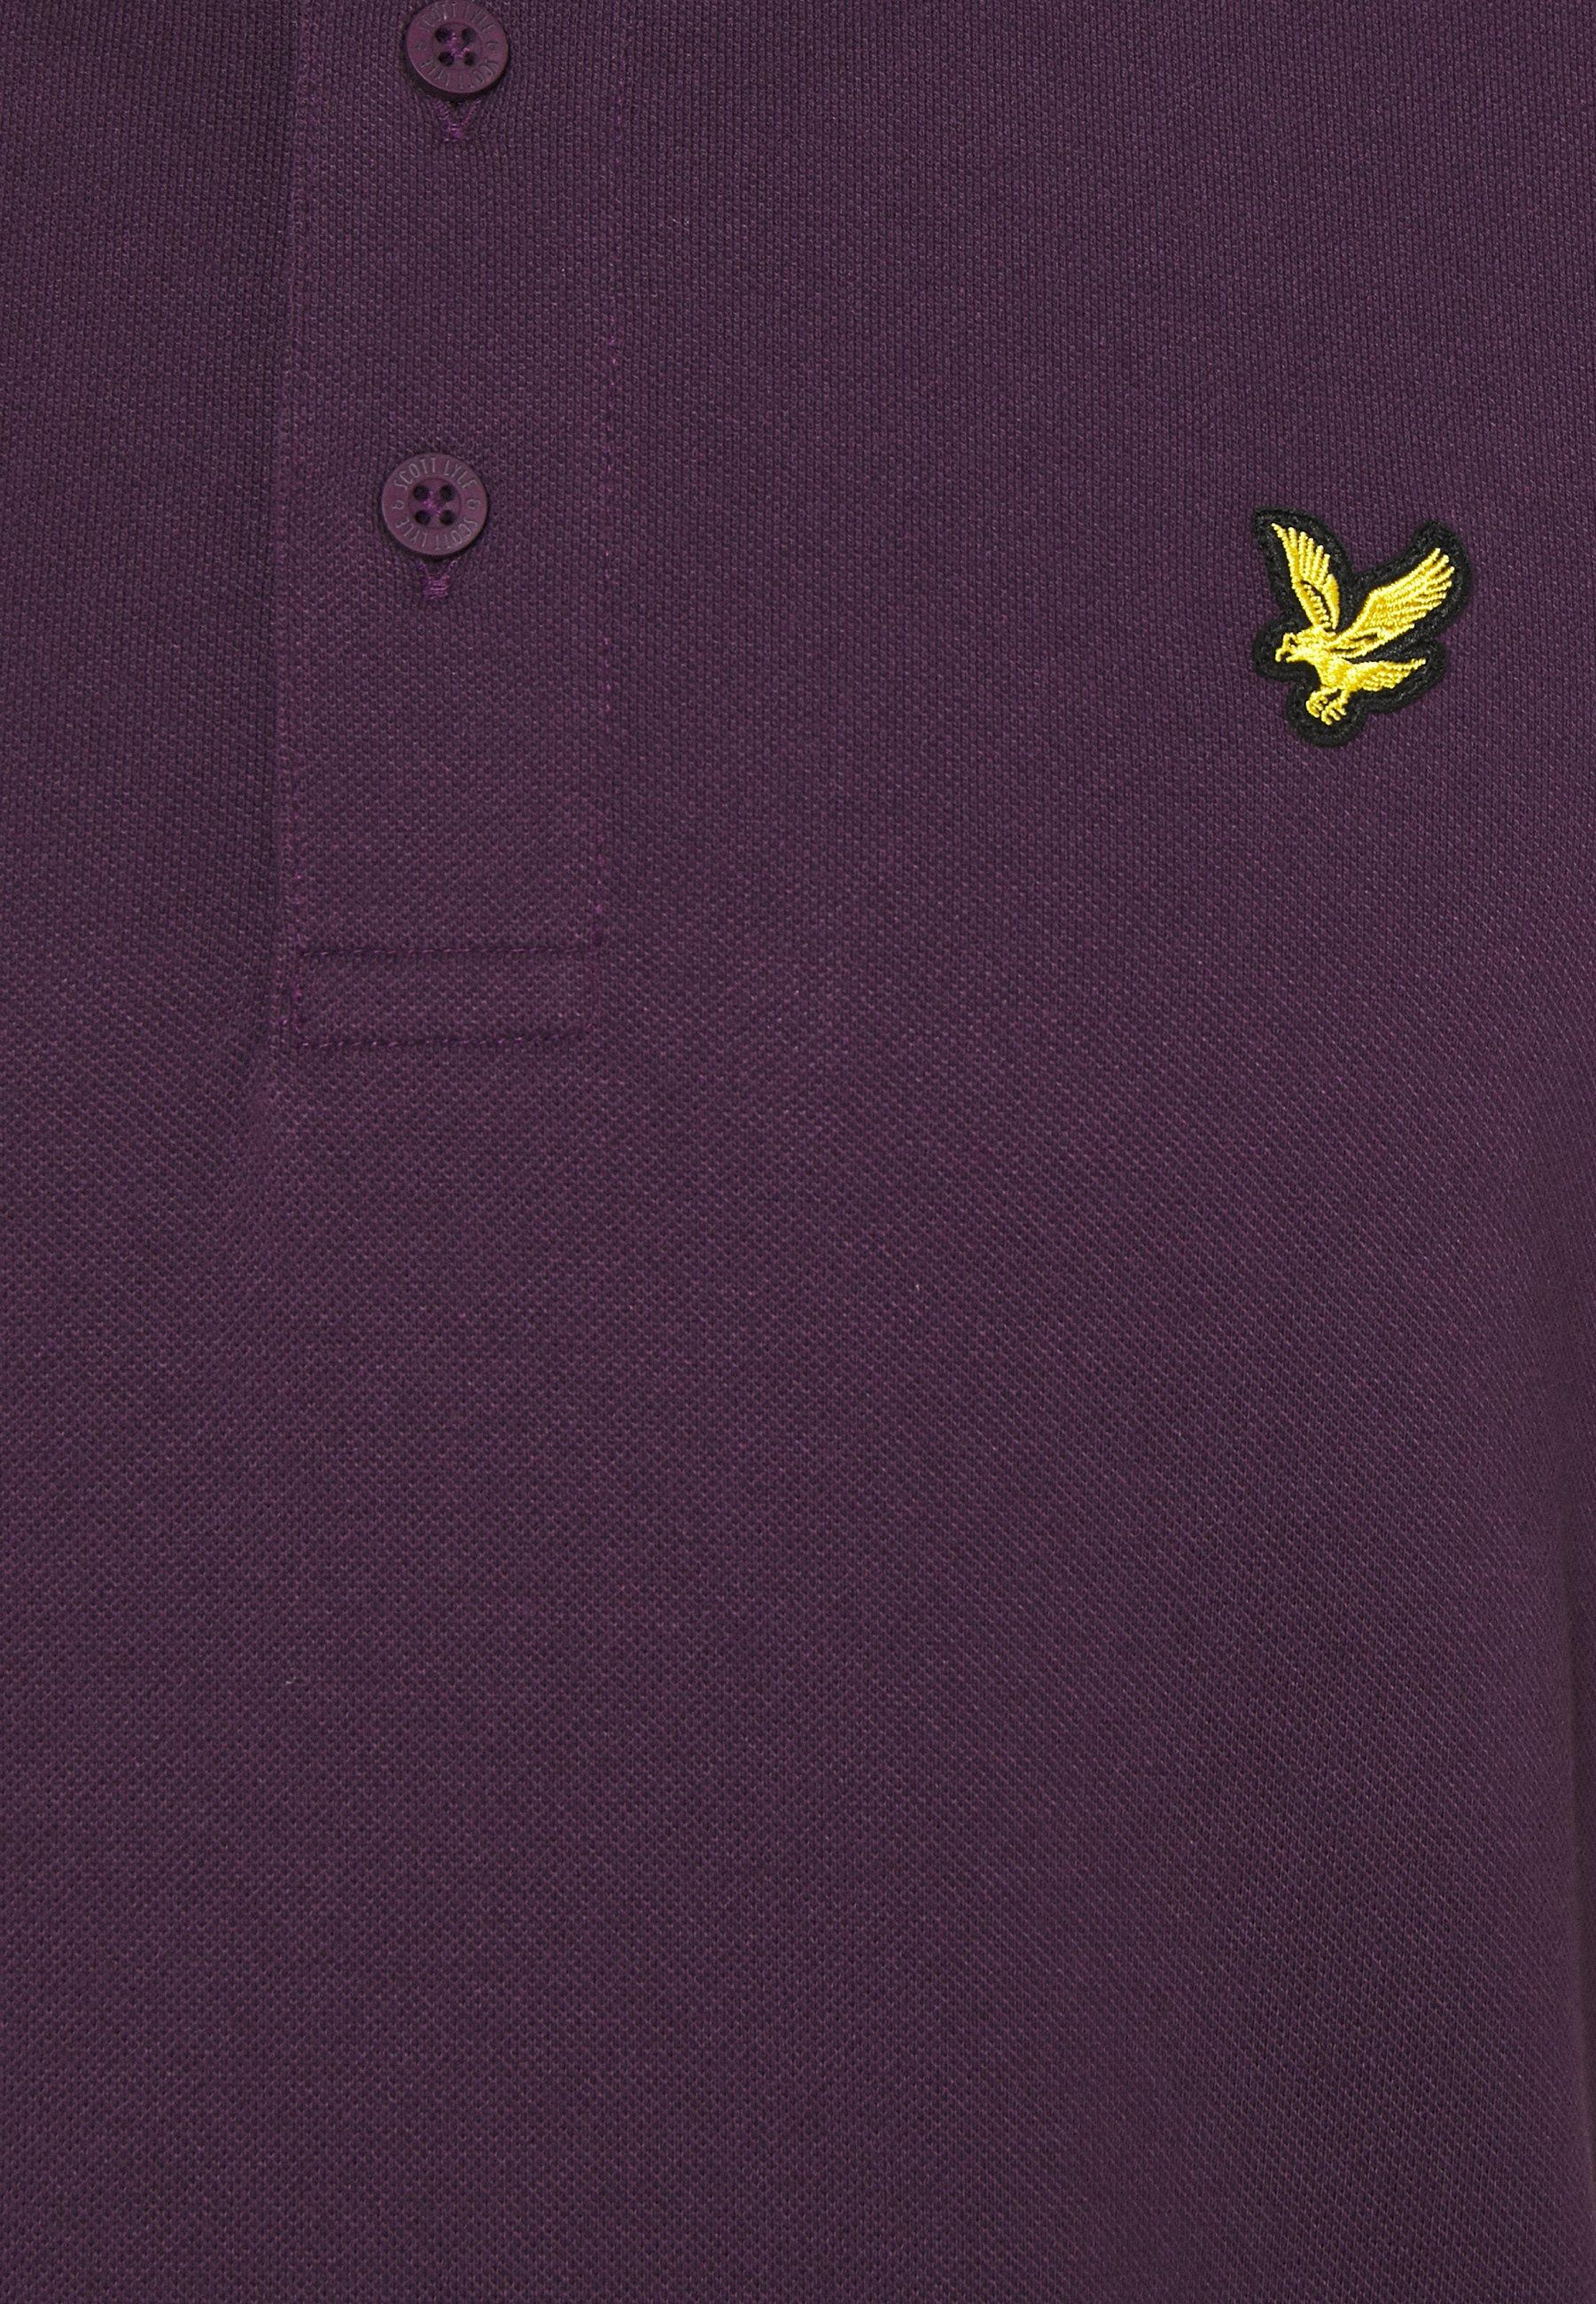 Shop For Get Men's Clothing Lyle & Scott ANDREW Sports shirt plum wine XEj6d21Ft lq3degS2Y